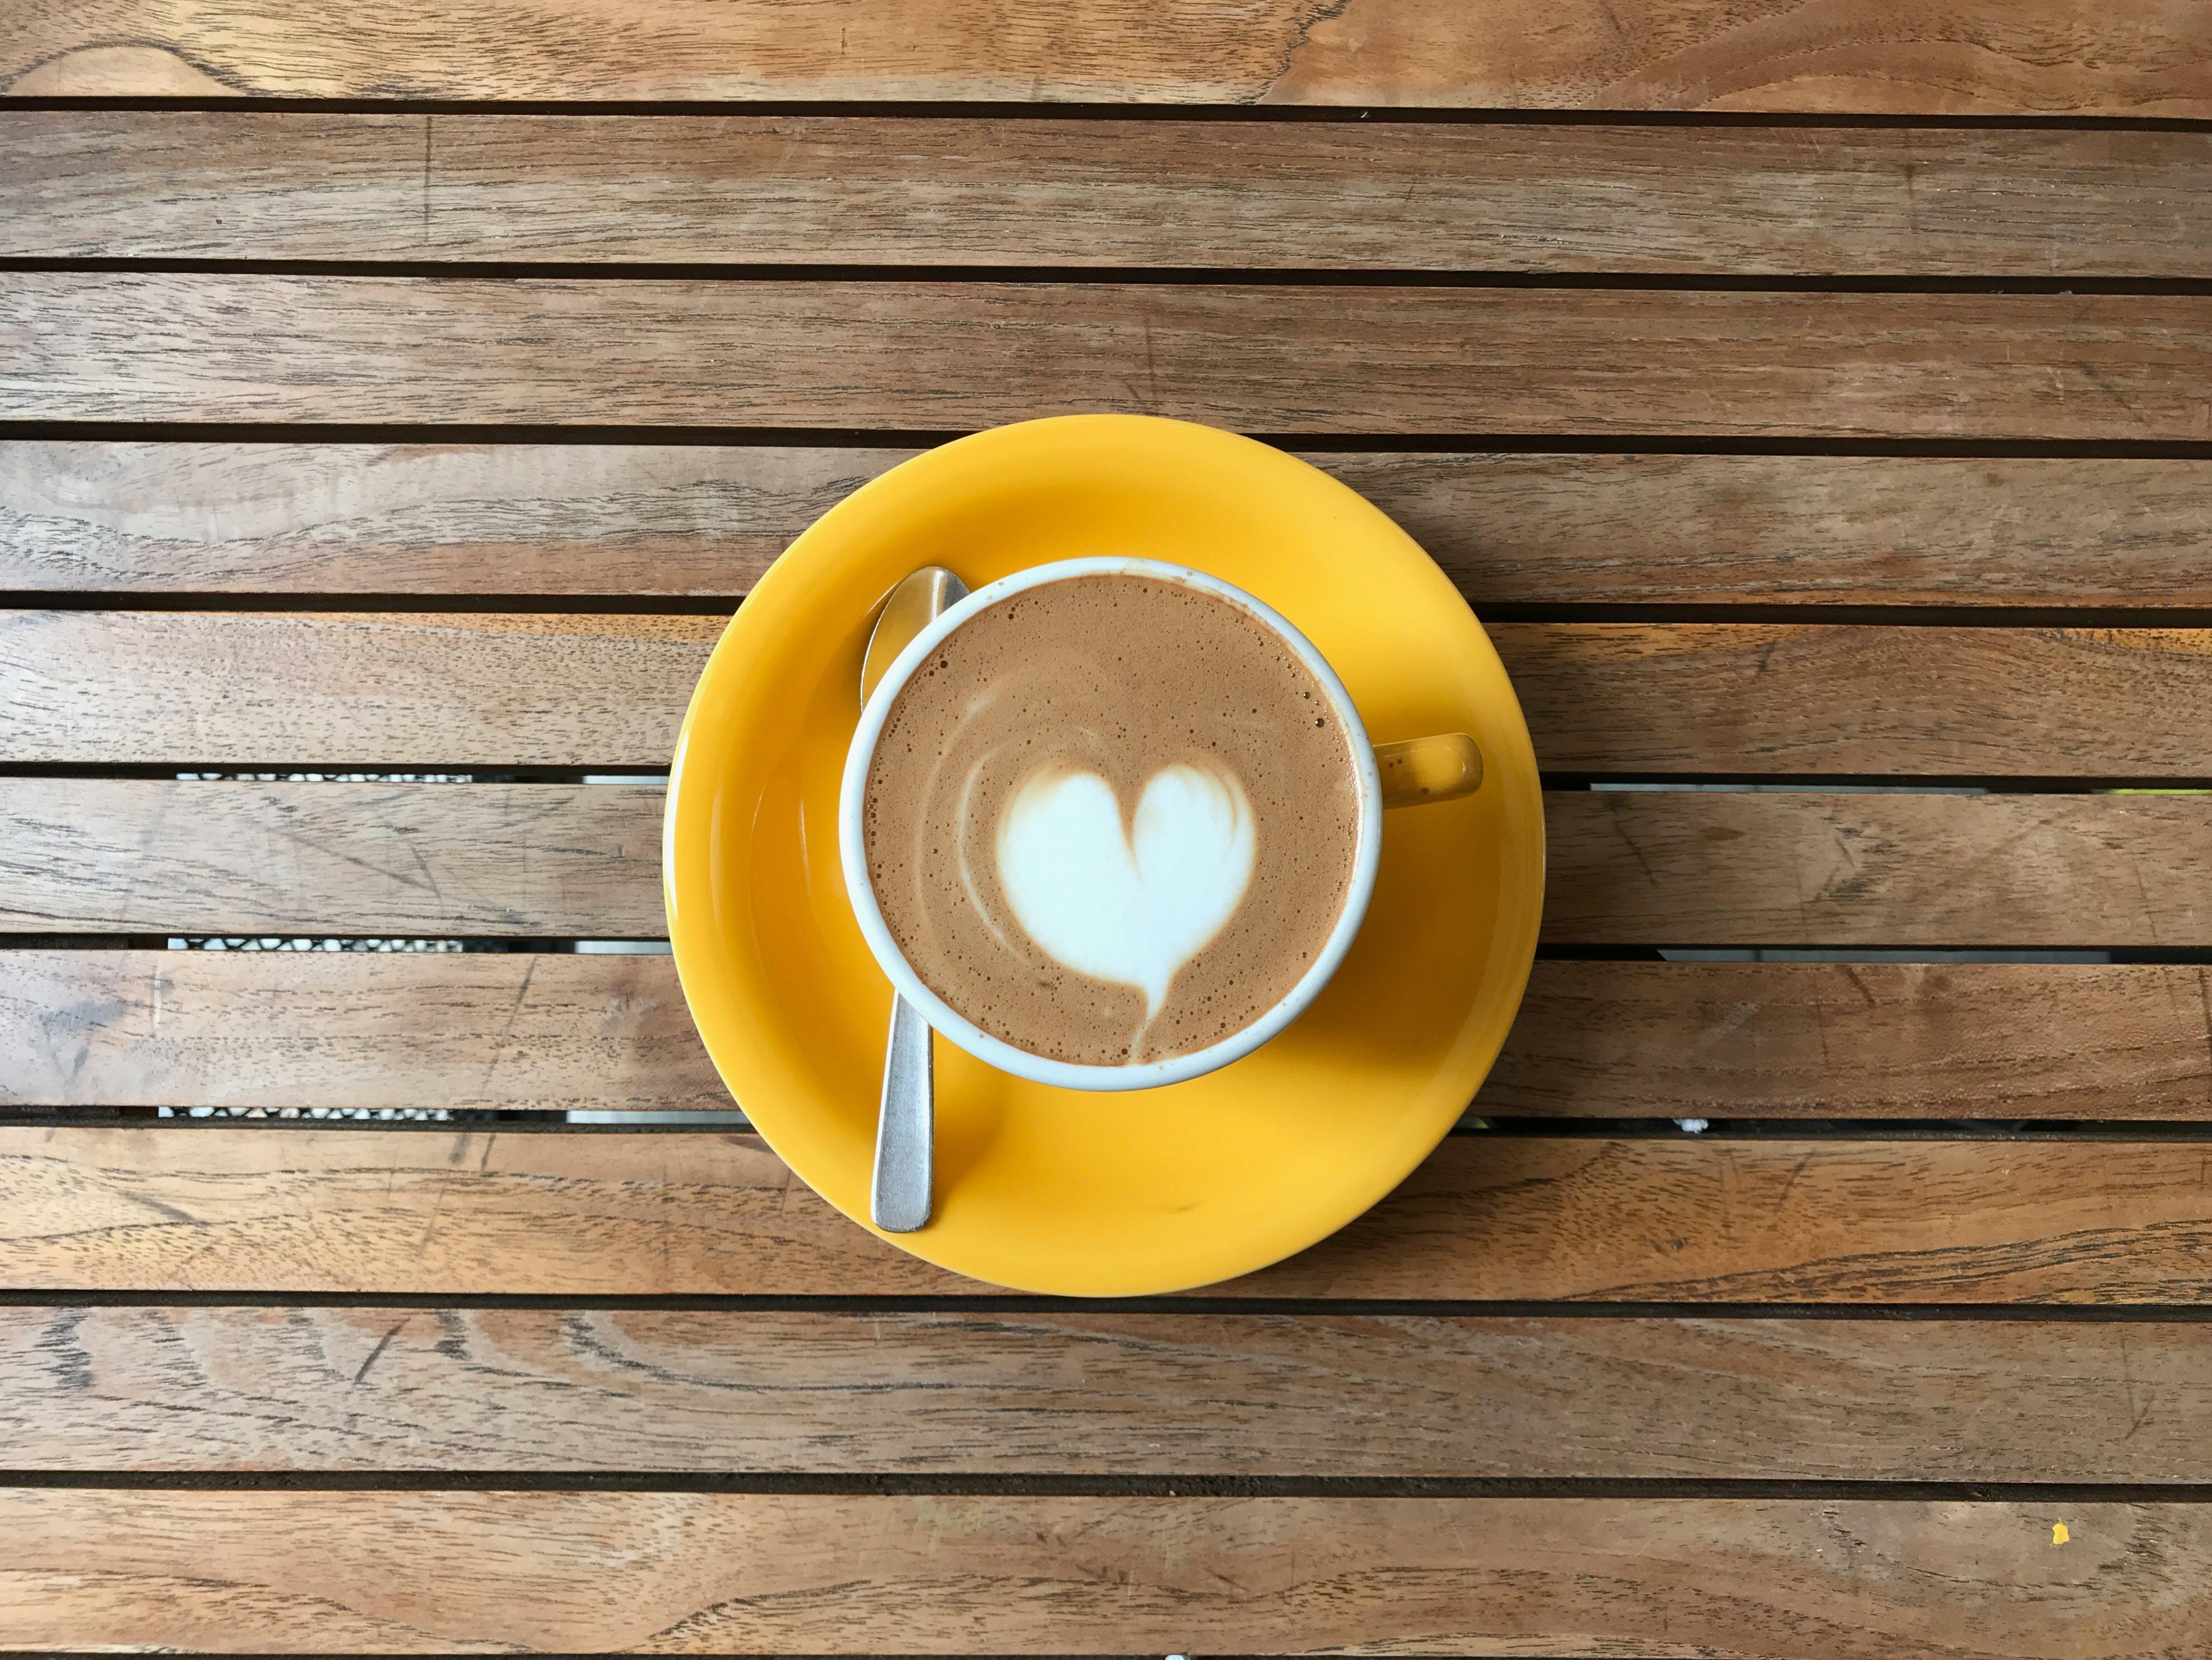 cappuccino, ceramic, chocolate